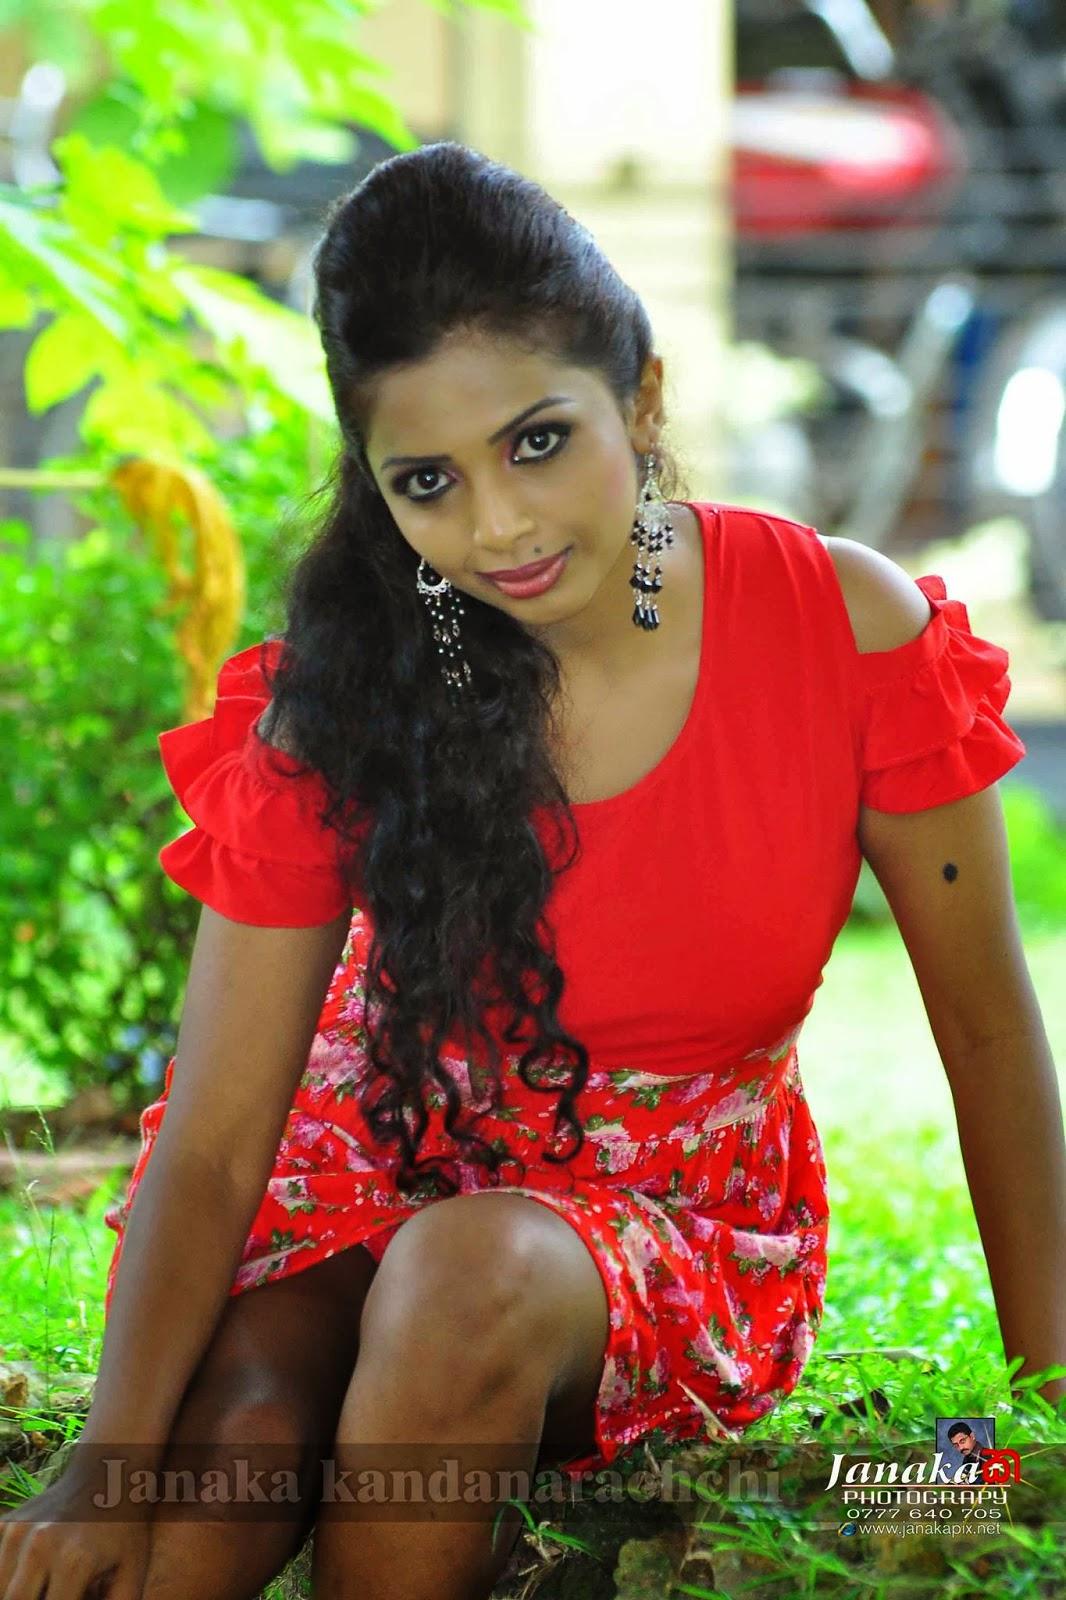 Lakshika Jayawardhana hot legs open